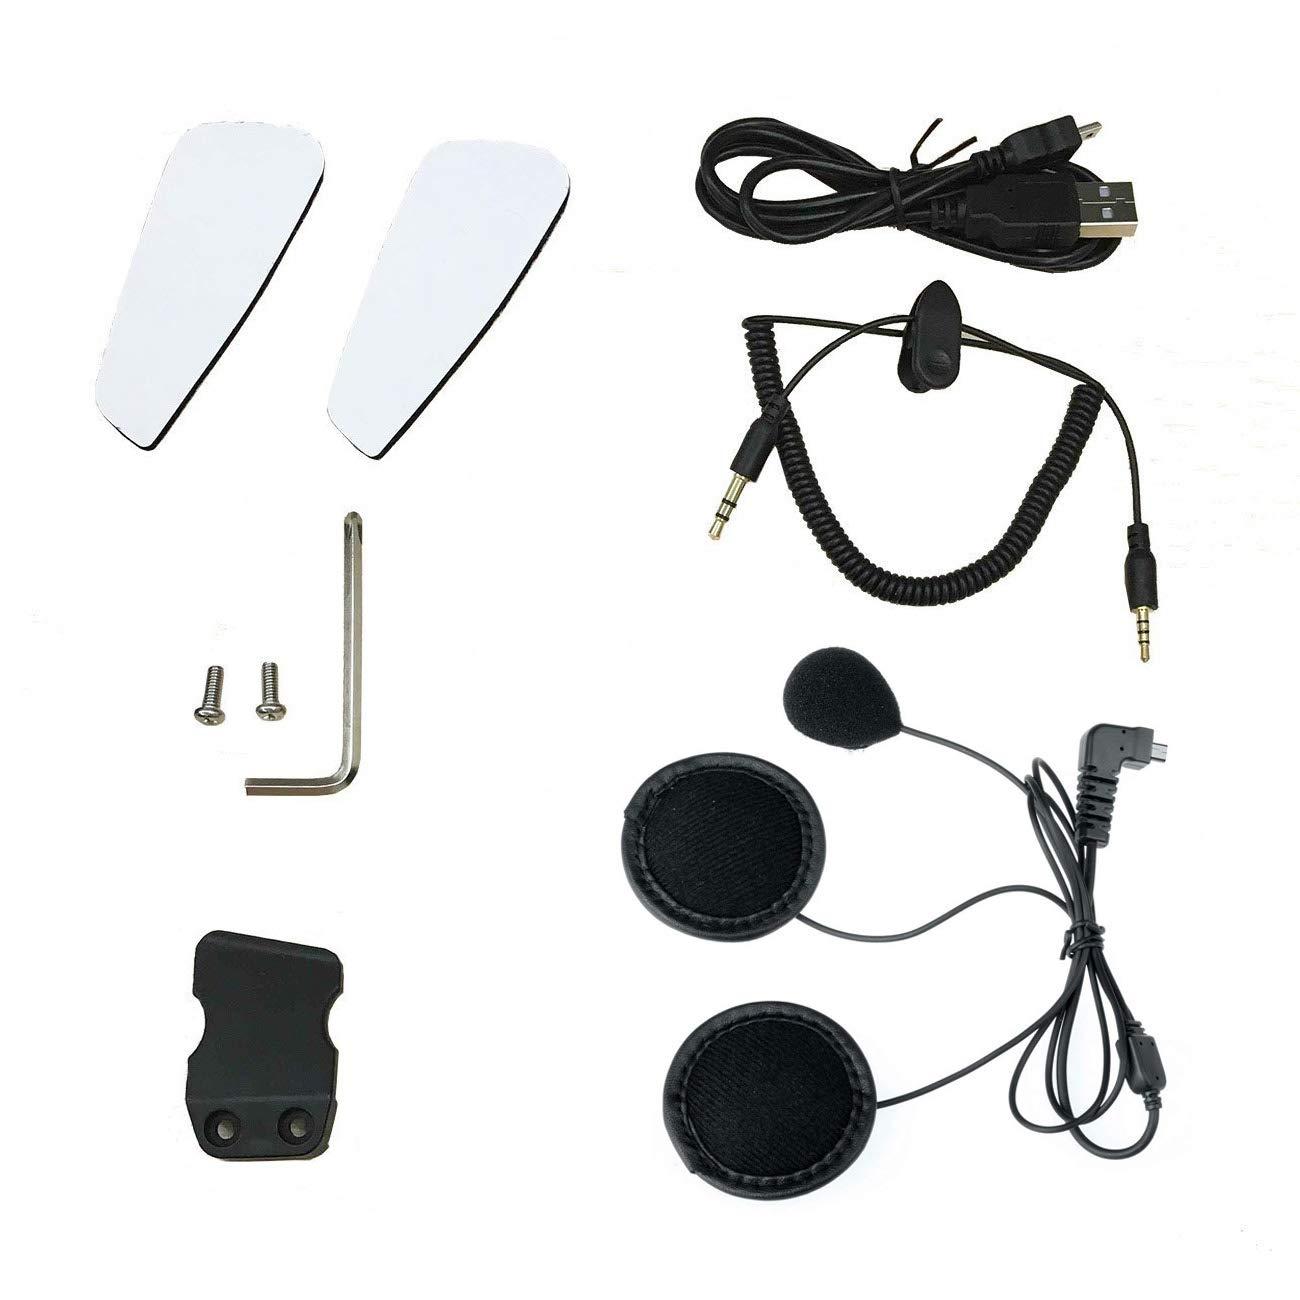 BT-S2 Motorcycle Intercom Soft Earphone Microphone Accessories